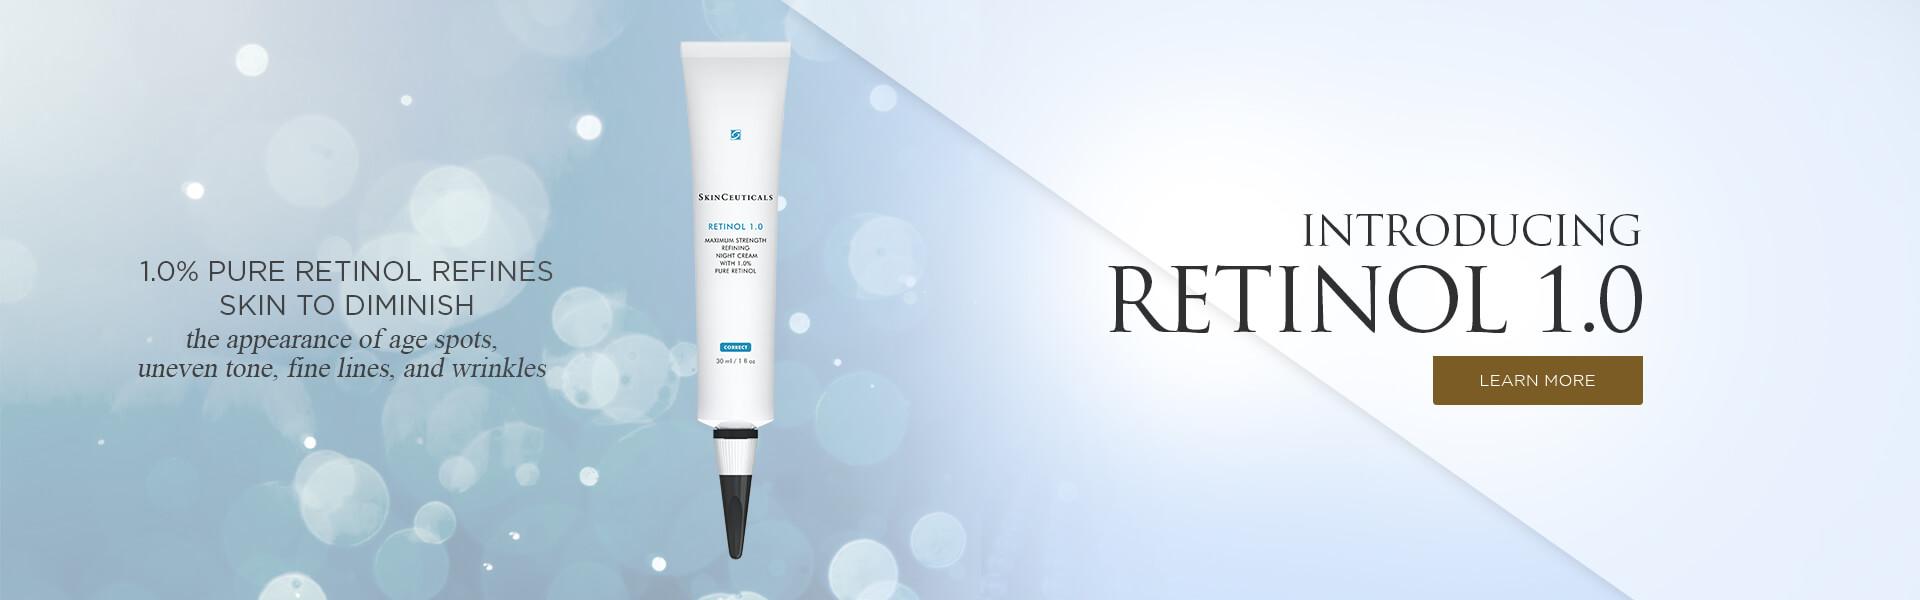 retinol-slider